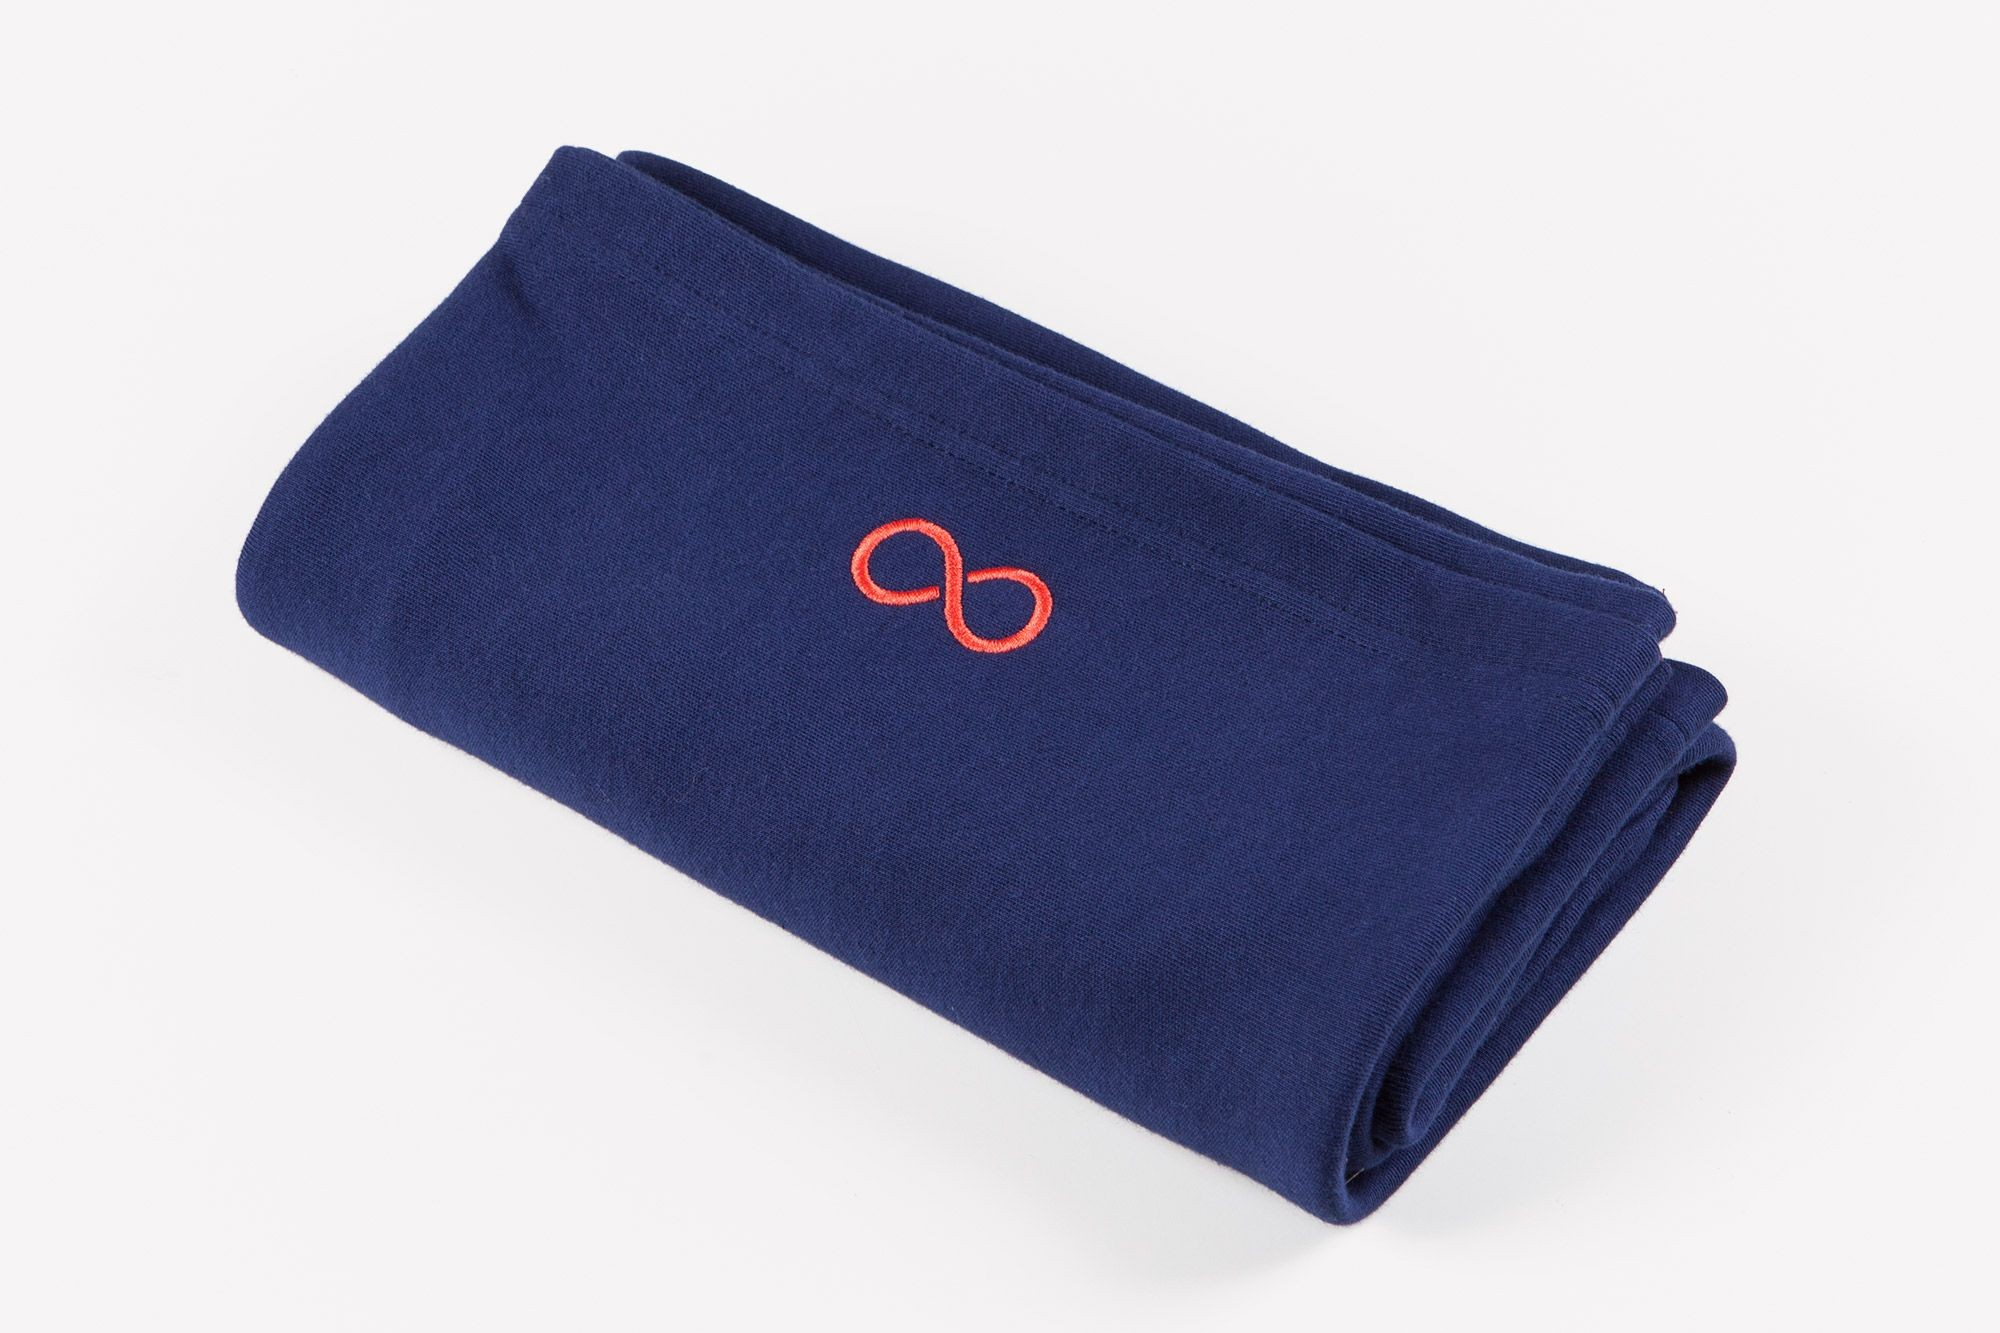 Bleu & orange (100% coton)